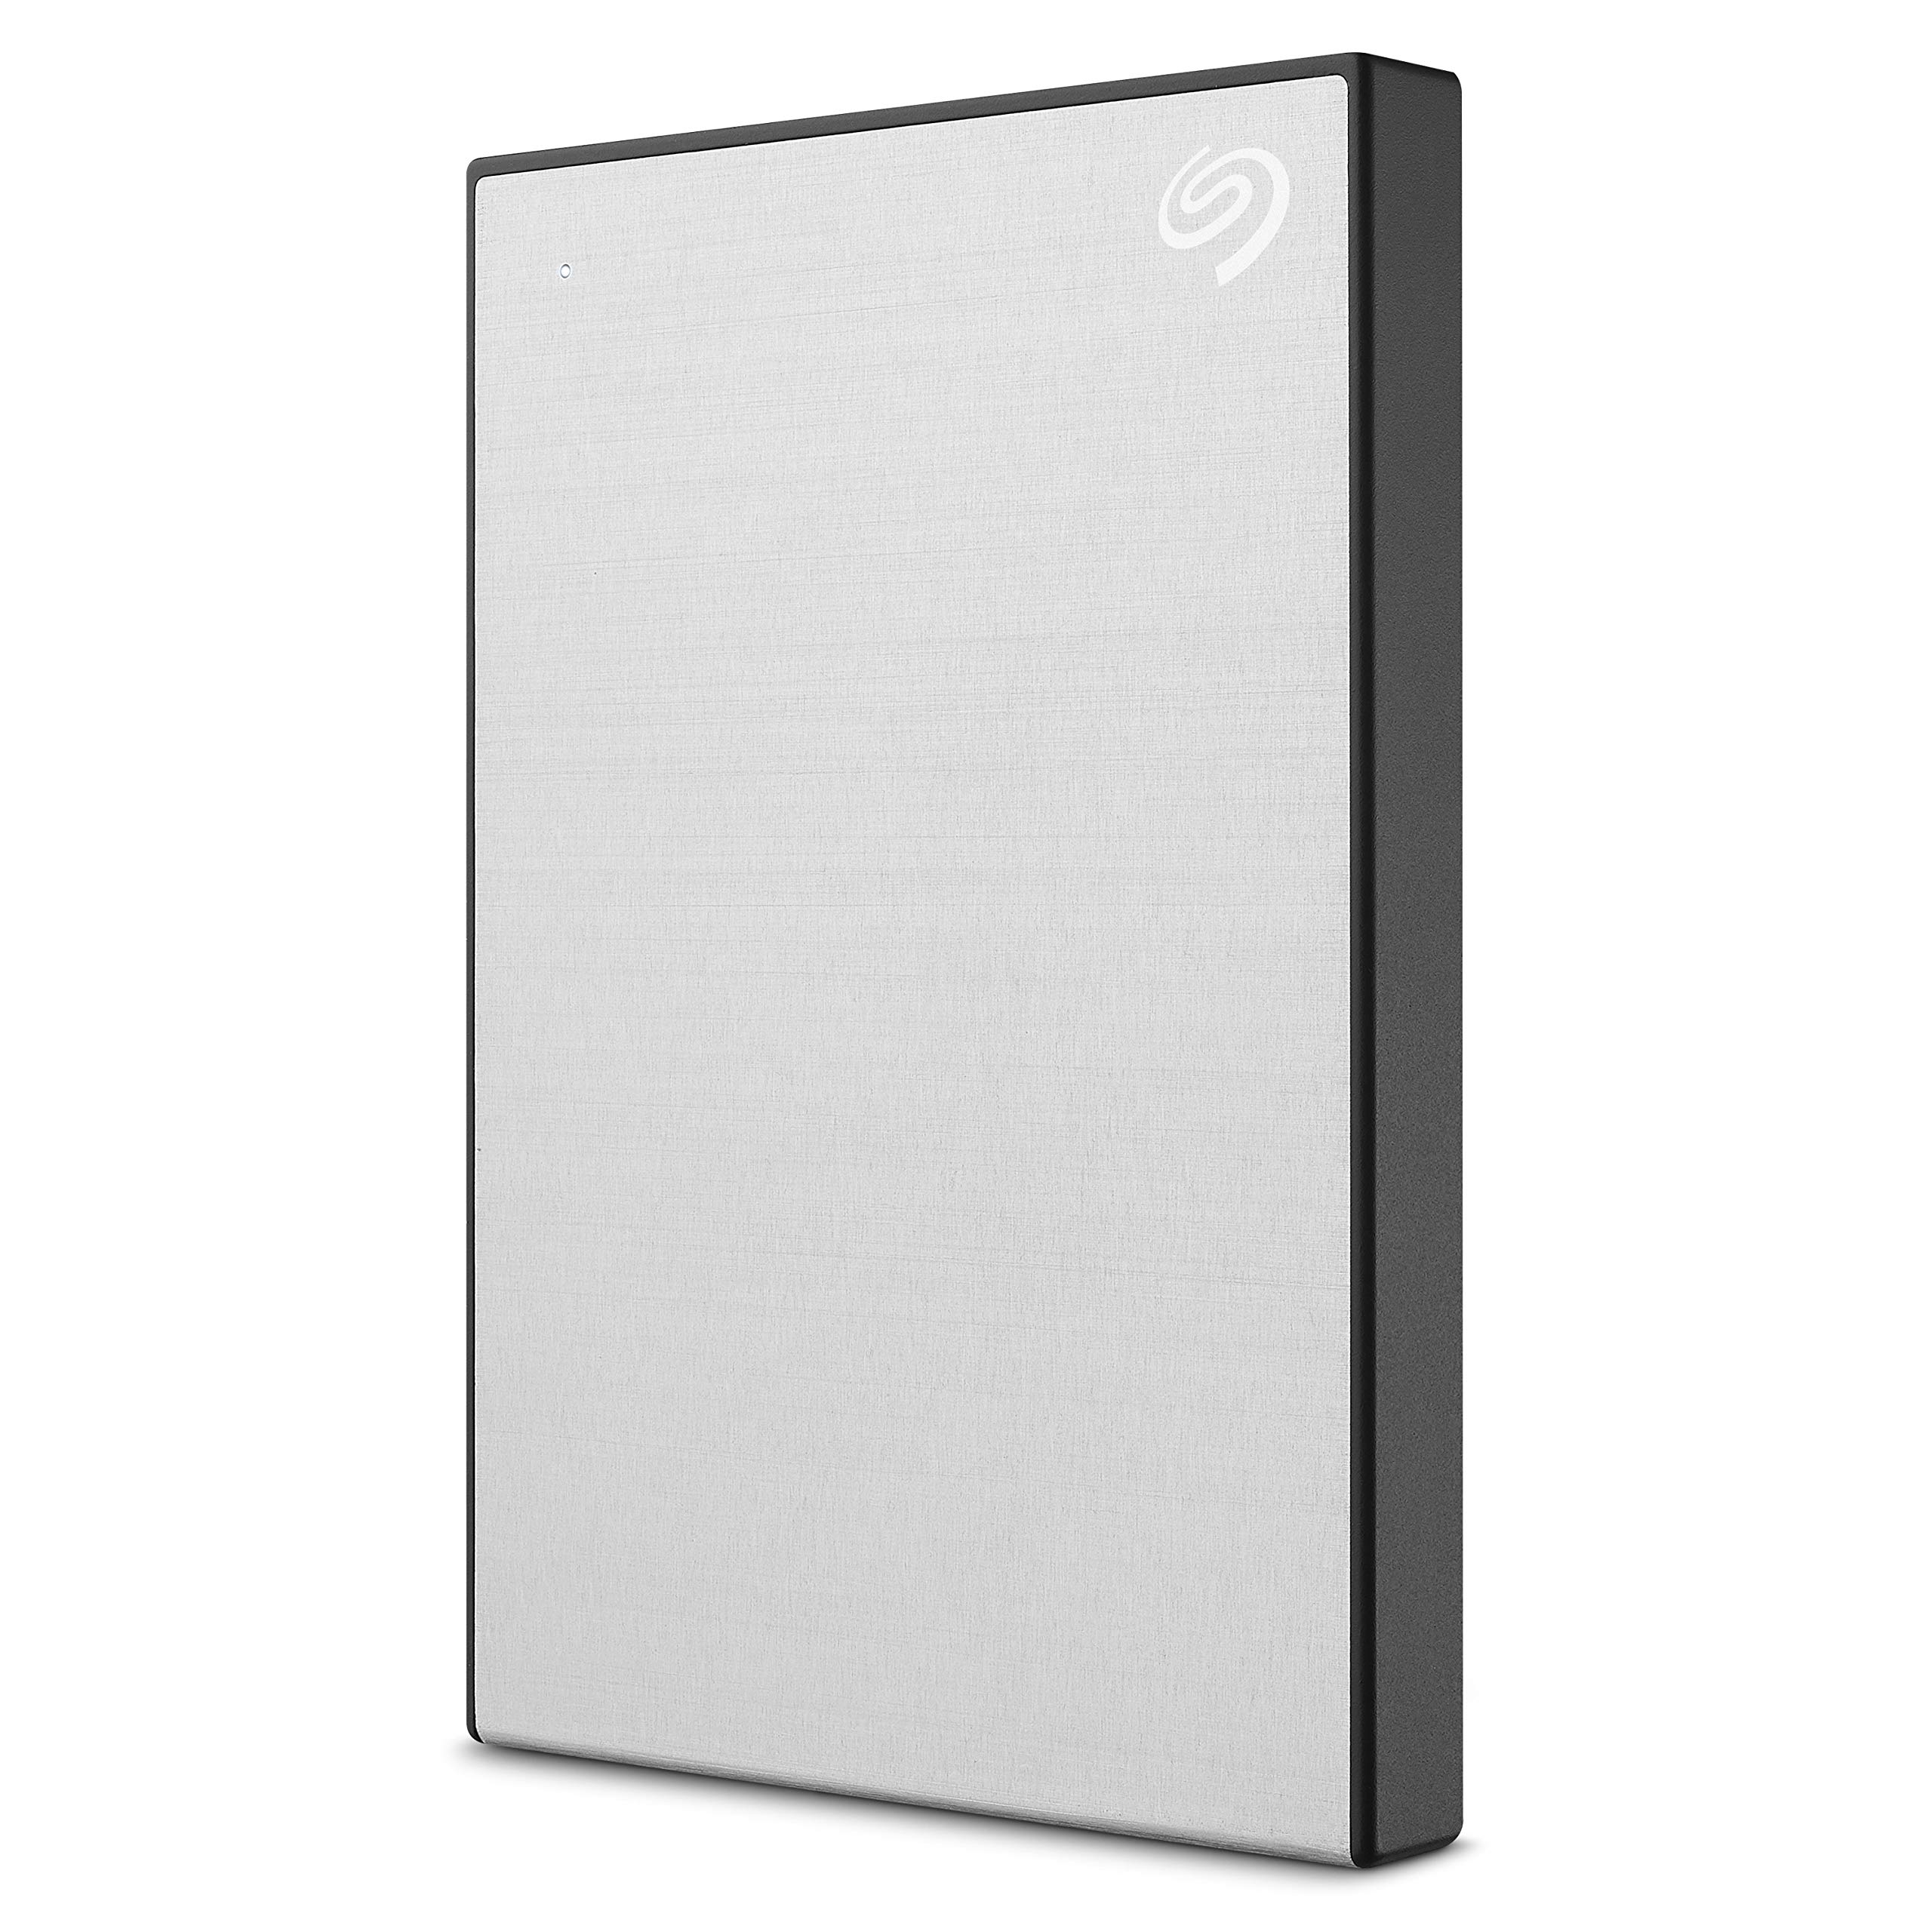 Seagate STHN2000401 Seagate 2TB Backup Plus Slim Portable External Hard Drive + 1Yr Mylio Create + 2MO Adobe CC Photography, Silver